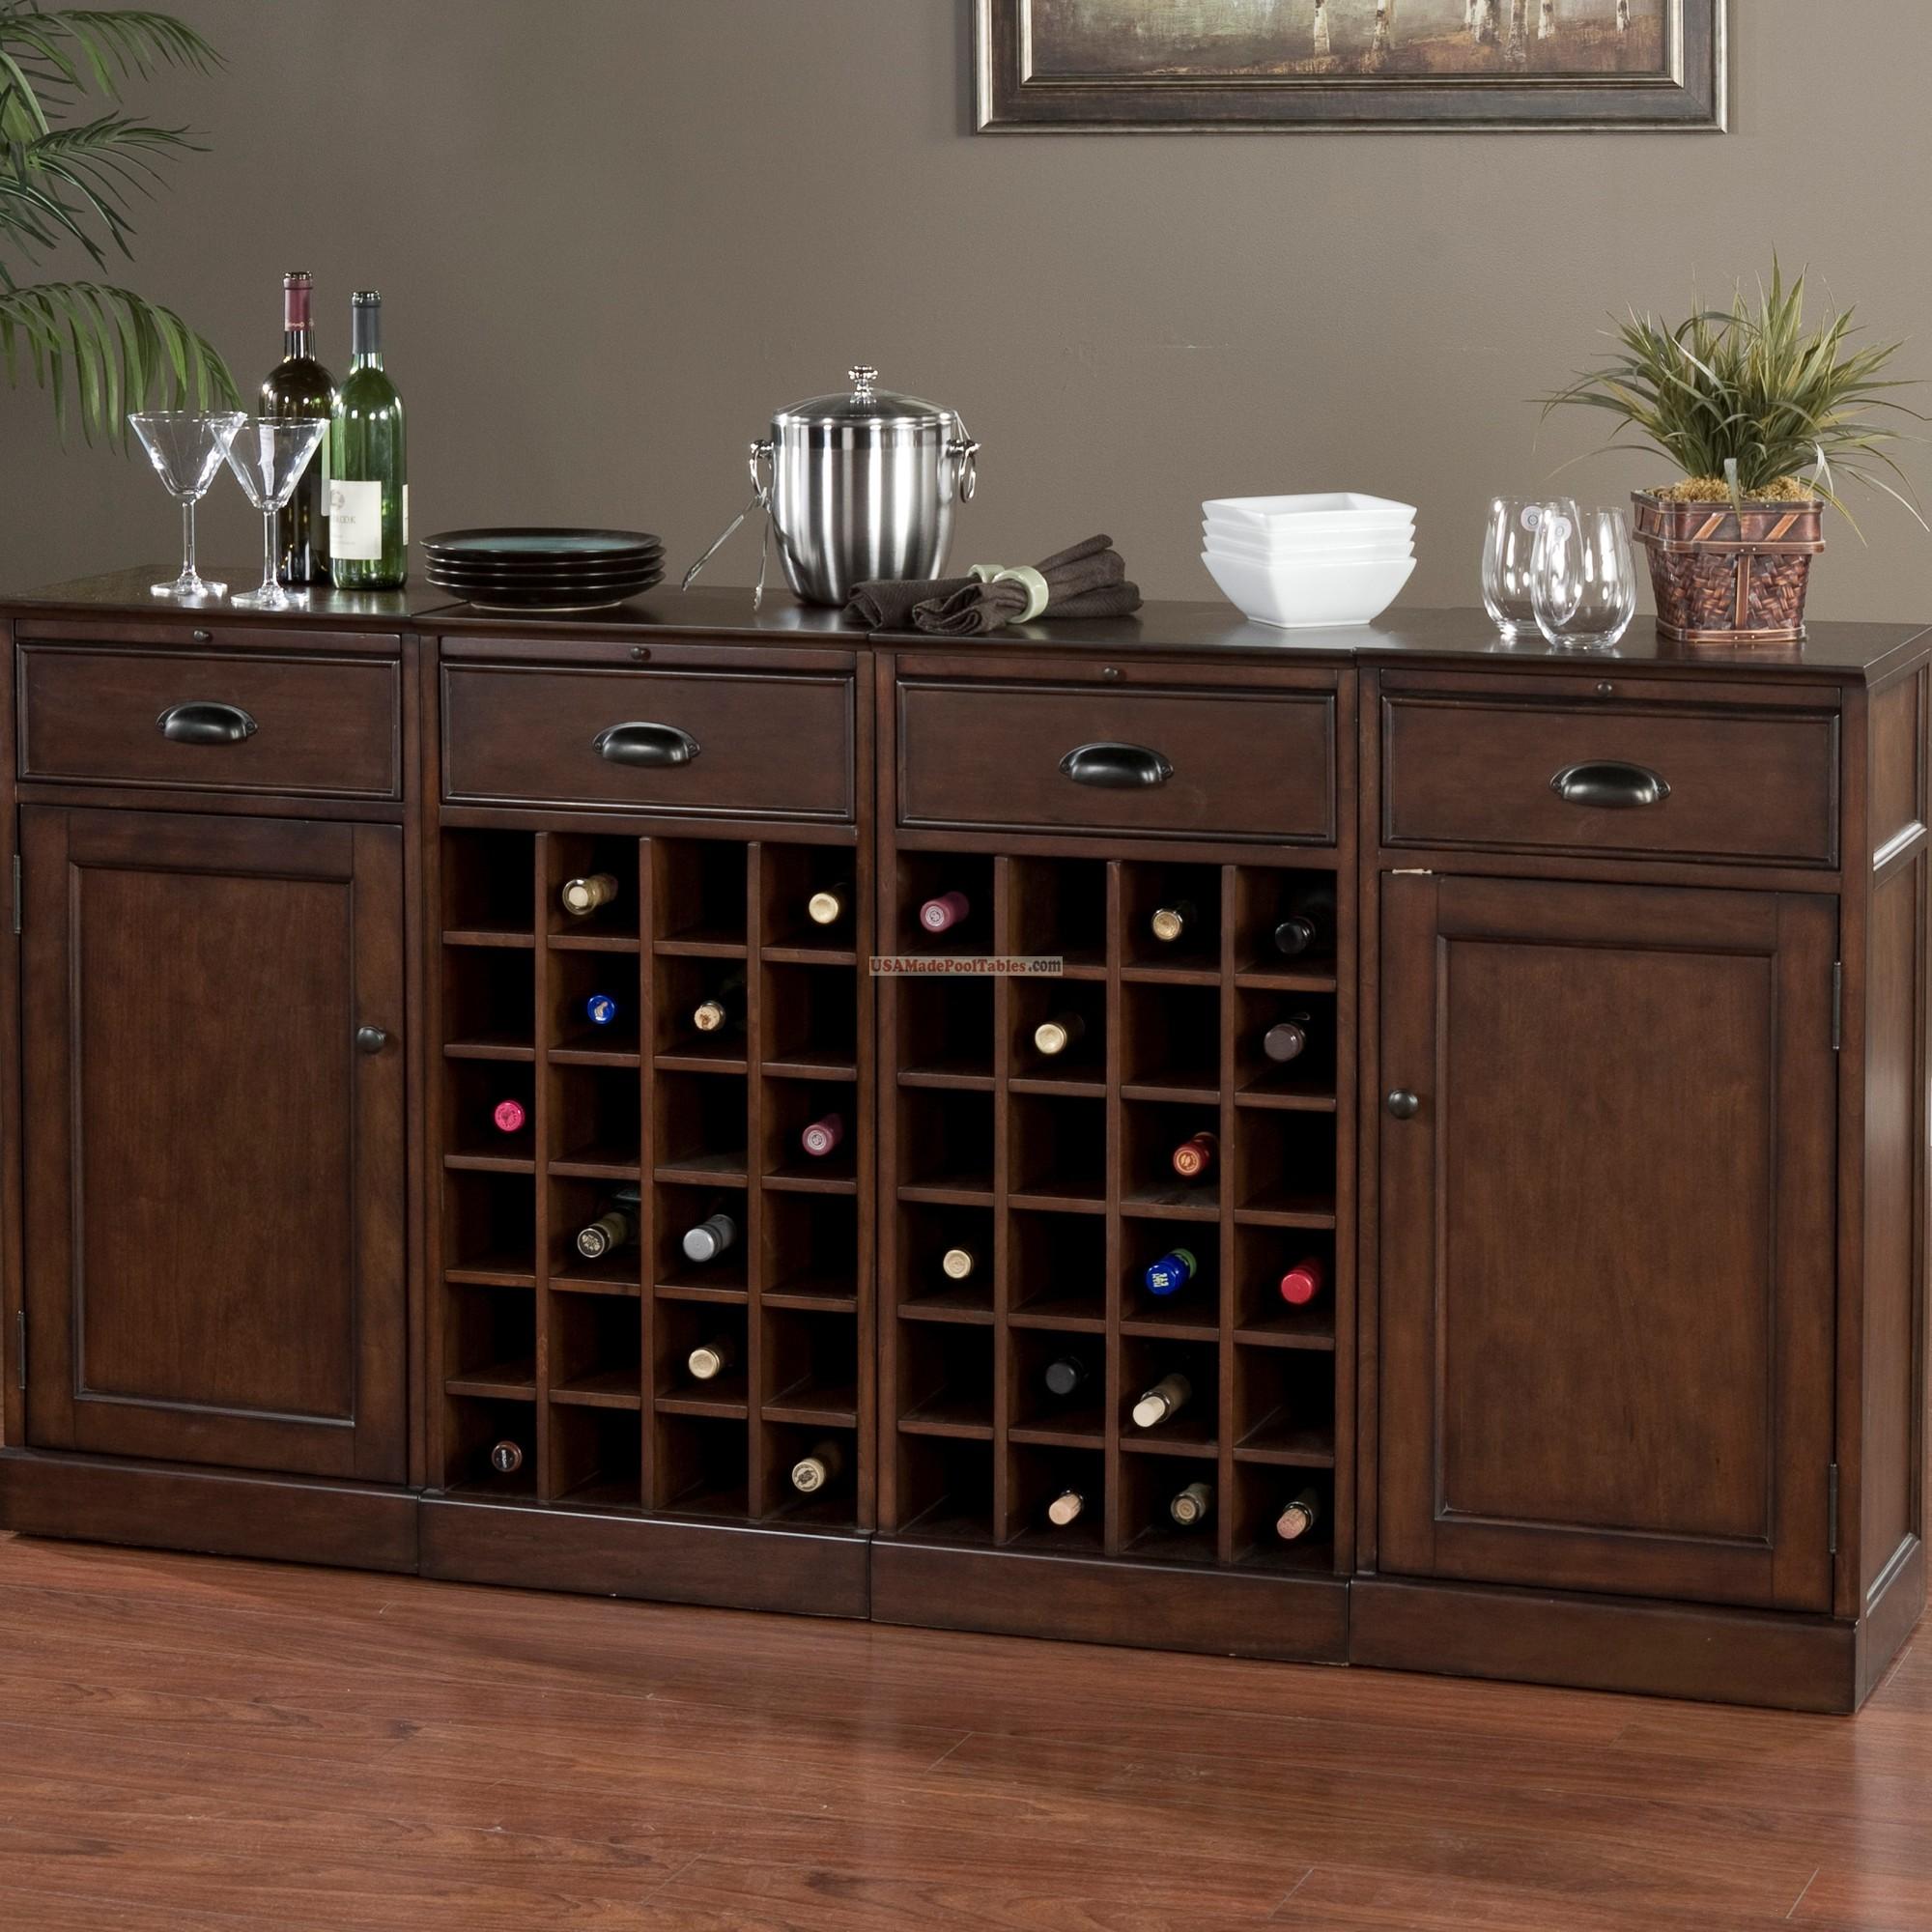 Home bar: MEBIHQP bar furniture